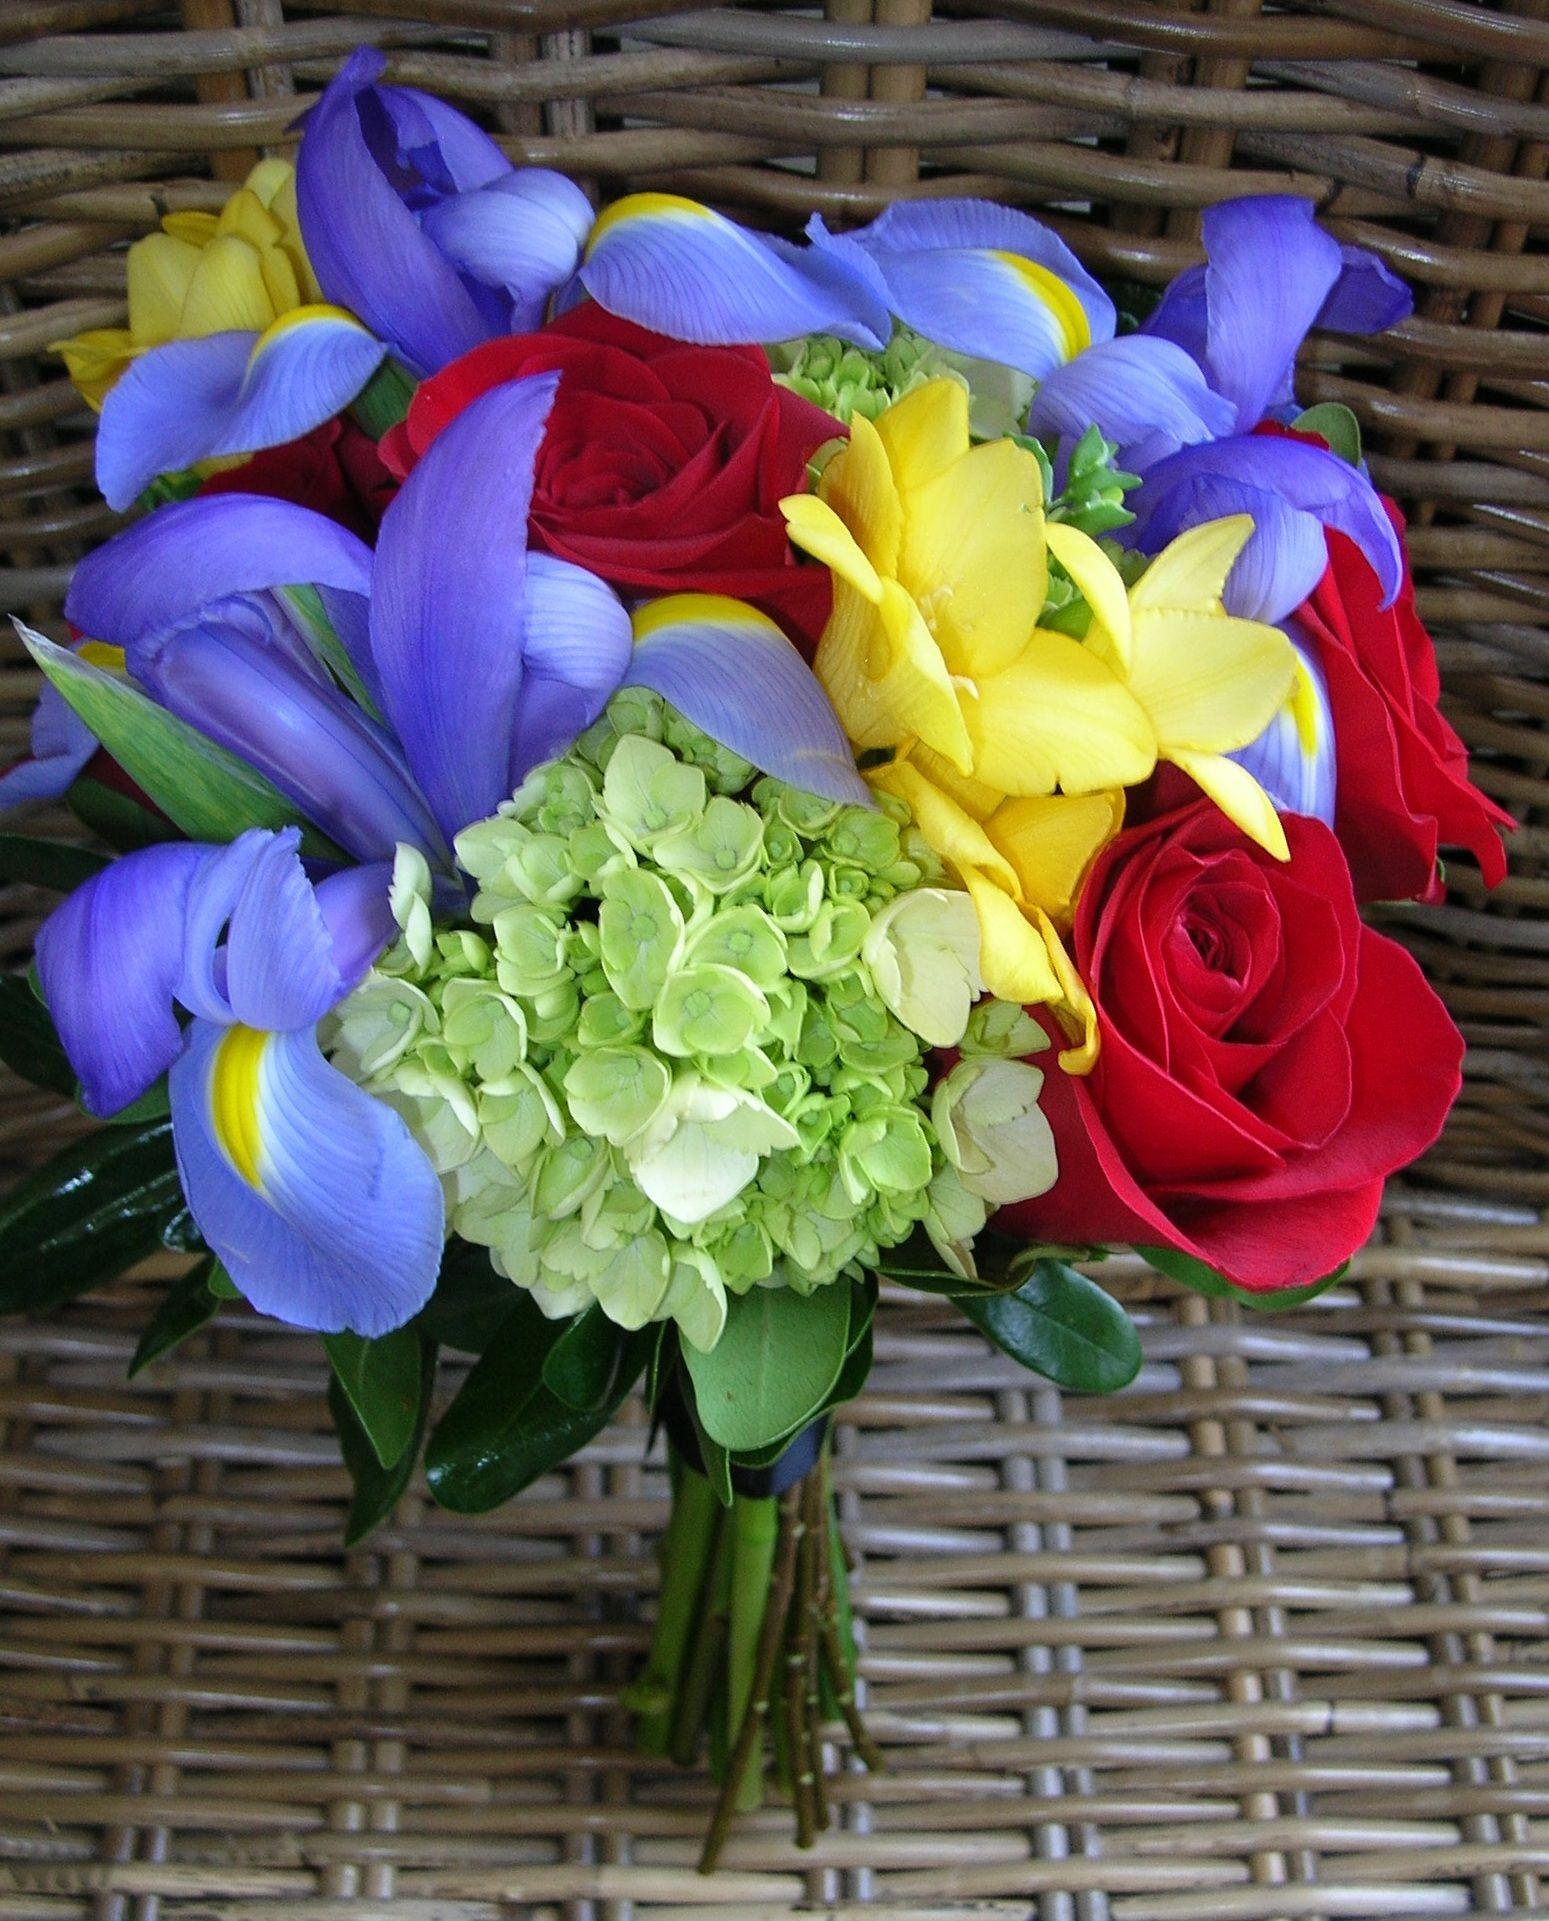 Green hydrangea yellow freesia red roses blue iris bouquet green hydrangea yellow freesia red roses blue iris bouquet mightylinksfo